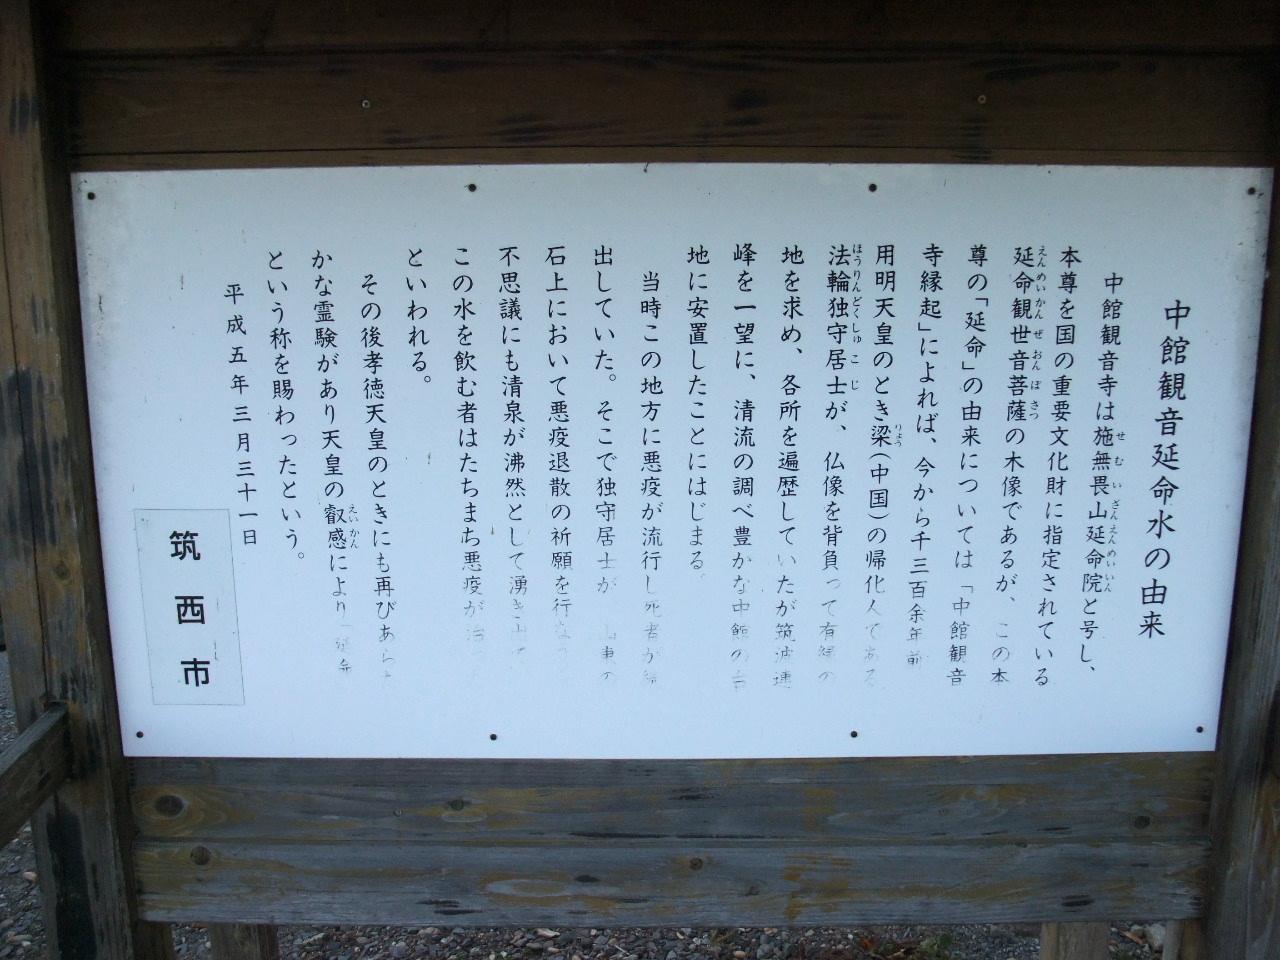 遠近両用 : 今日の歴史探訪 -伊...